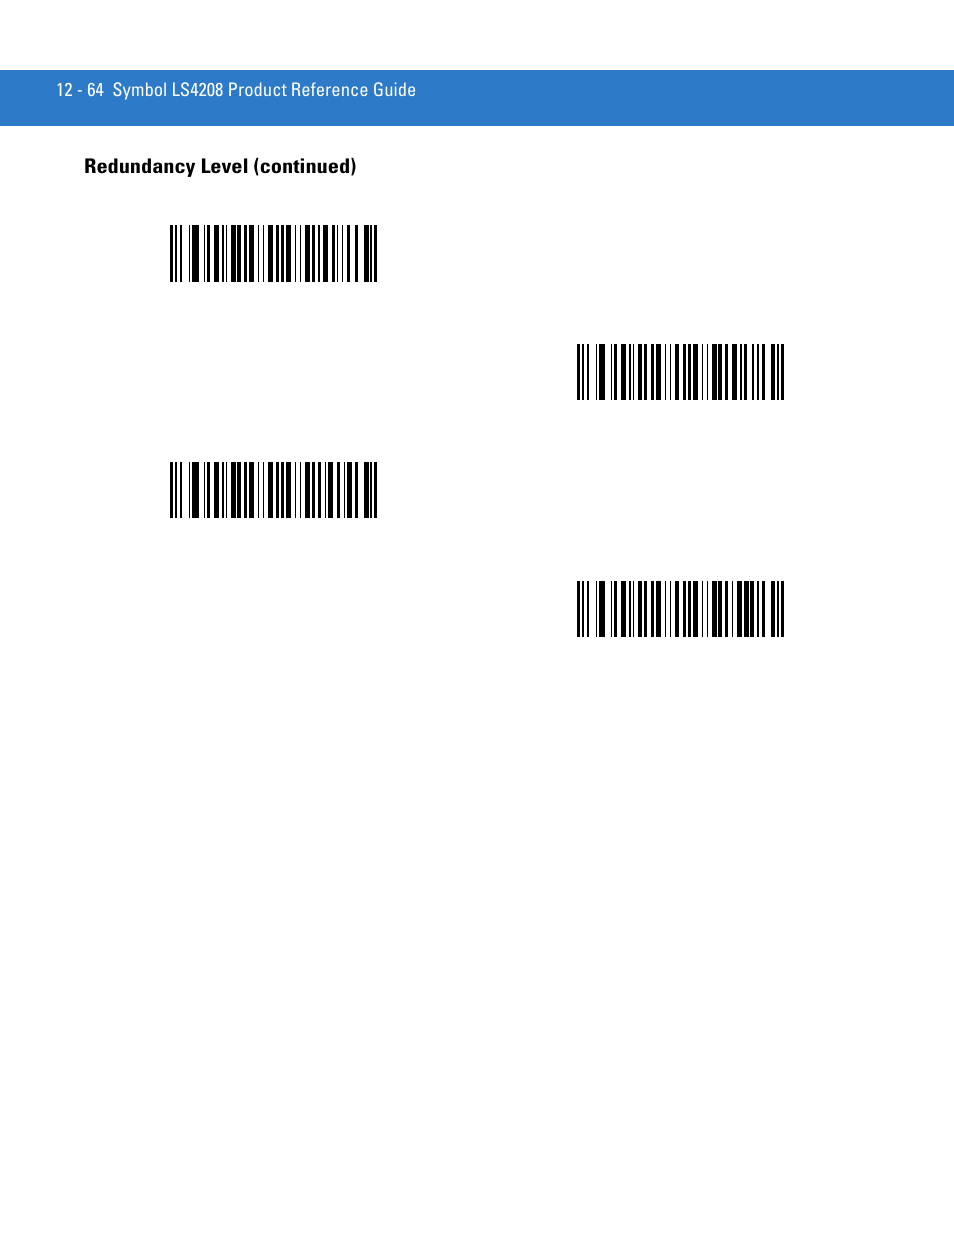 redundancy level continued motorola ls4208 user manual page rh manualsdir com Symbol LS3578 Symbol MC70